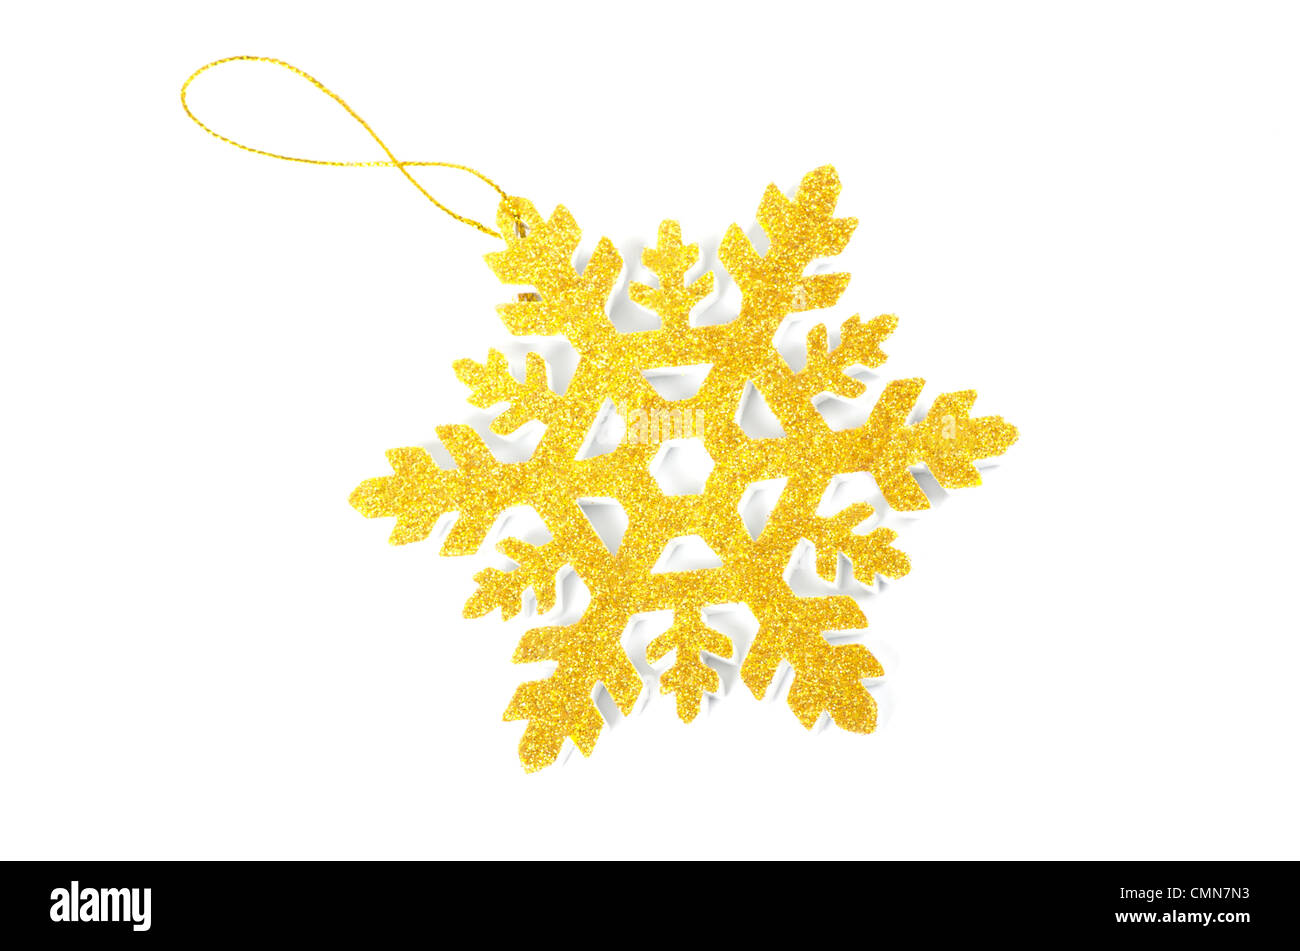 Christmas tree decoration star isolated on white background - Stock Image